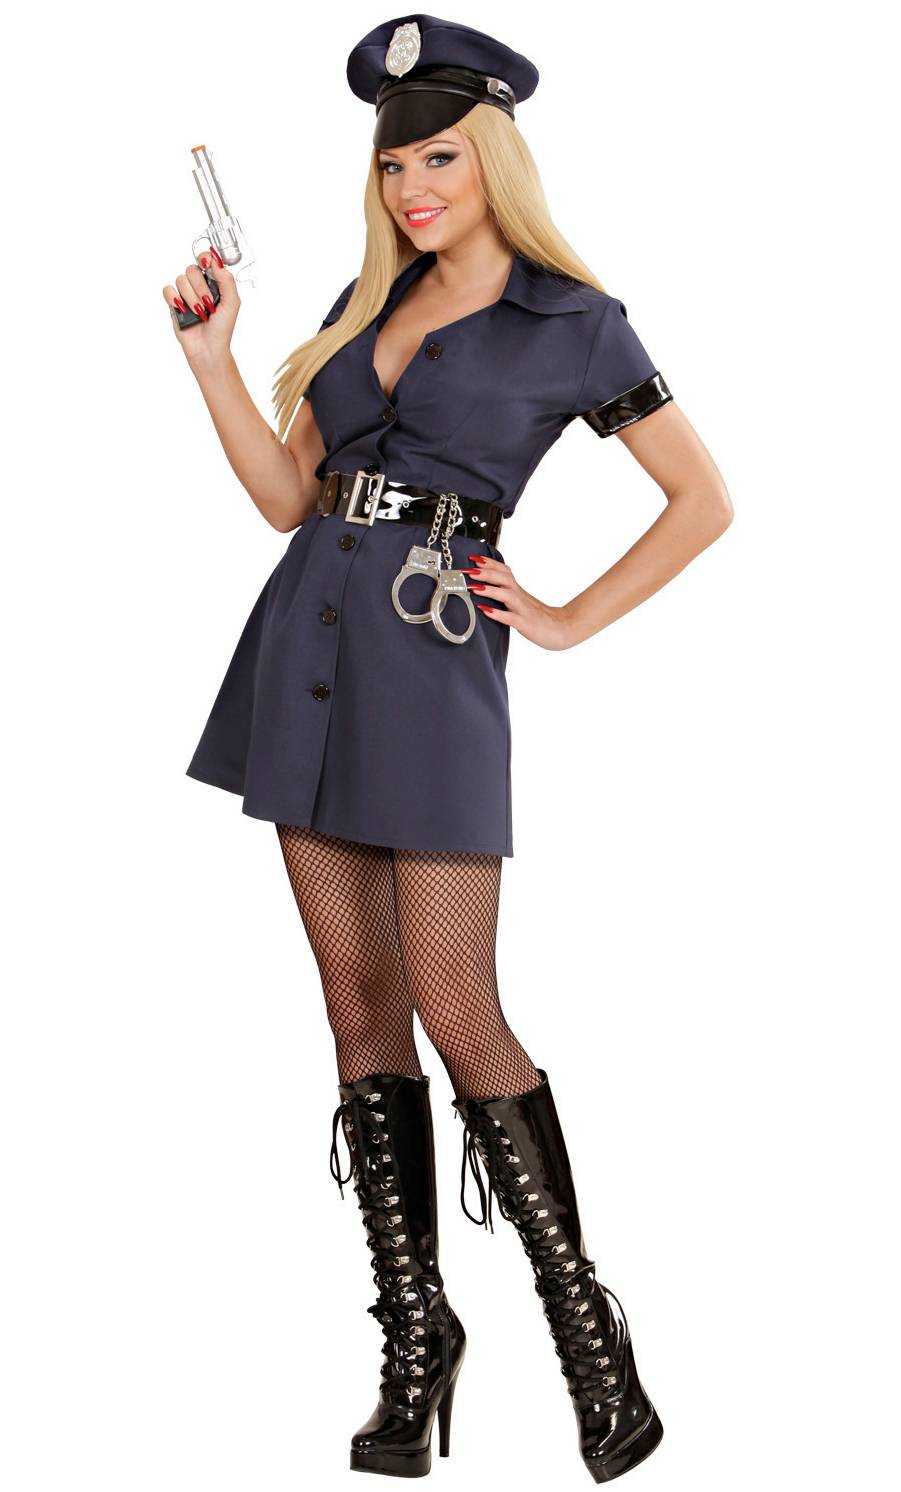 Costume de policière femme